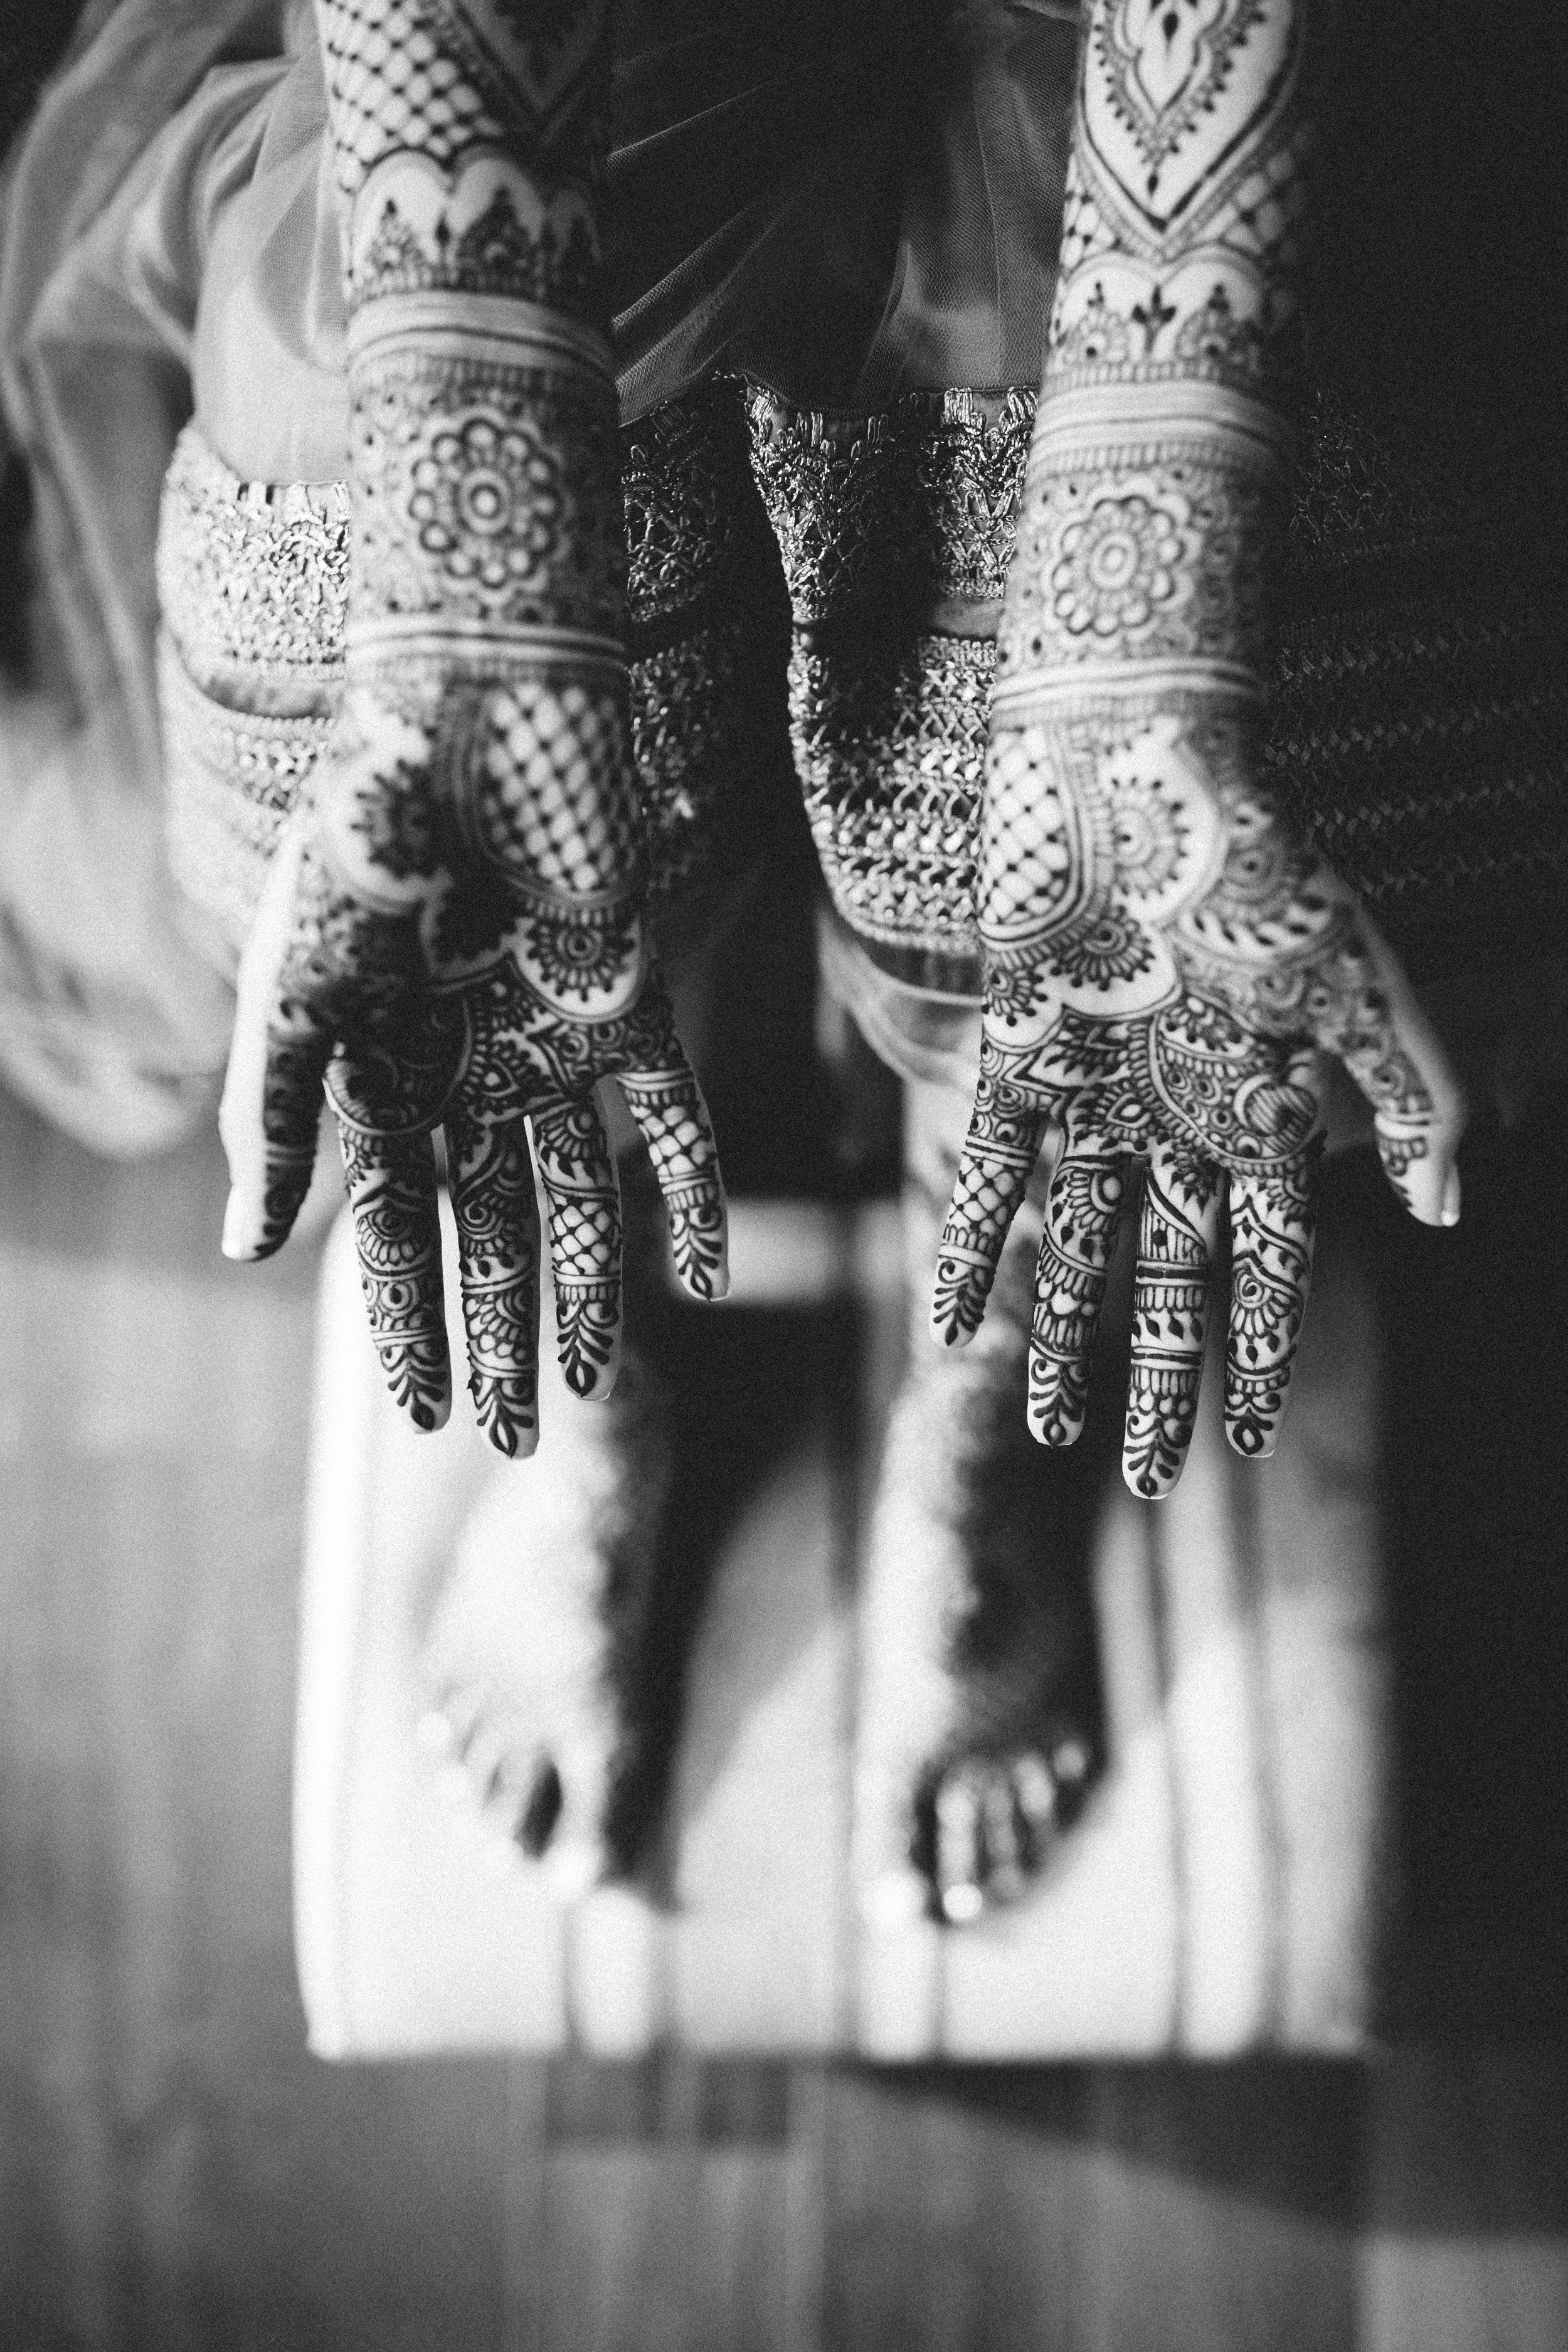 Aparna-Ankit-Patel-Mehndi-Wedding-Photos-0027.jpg